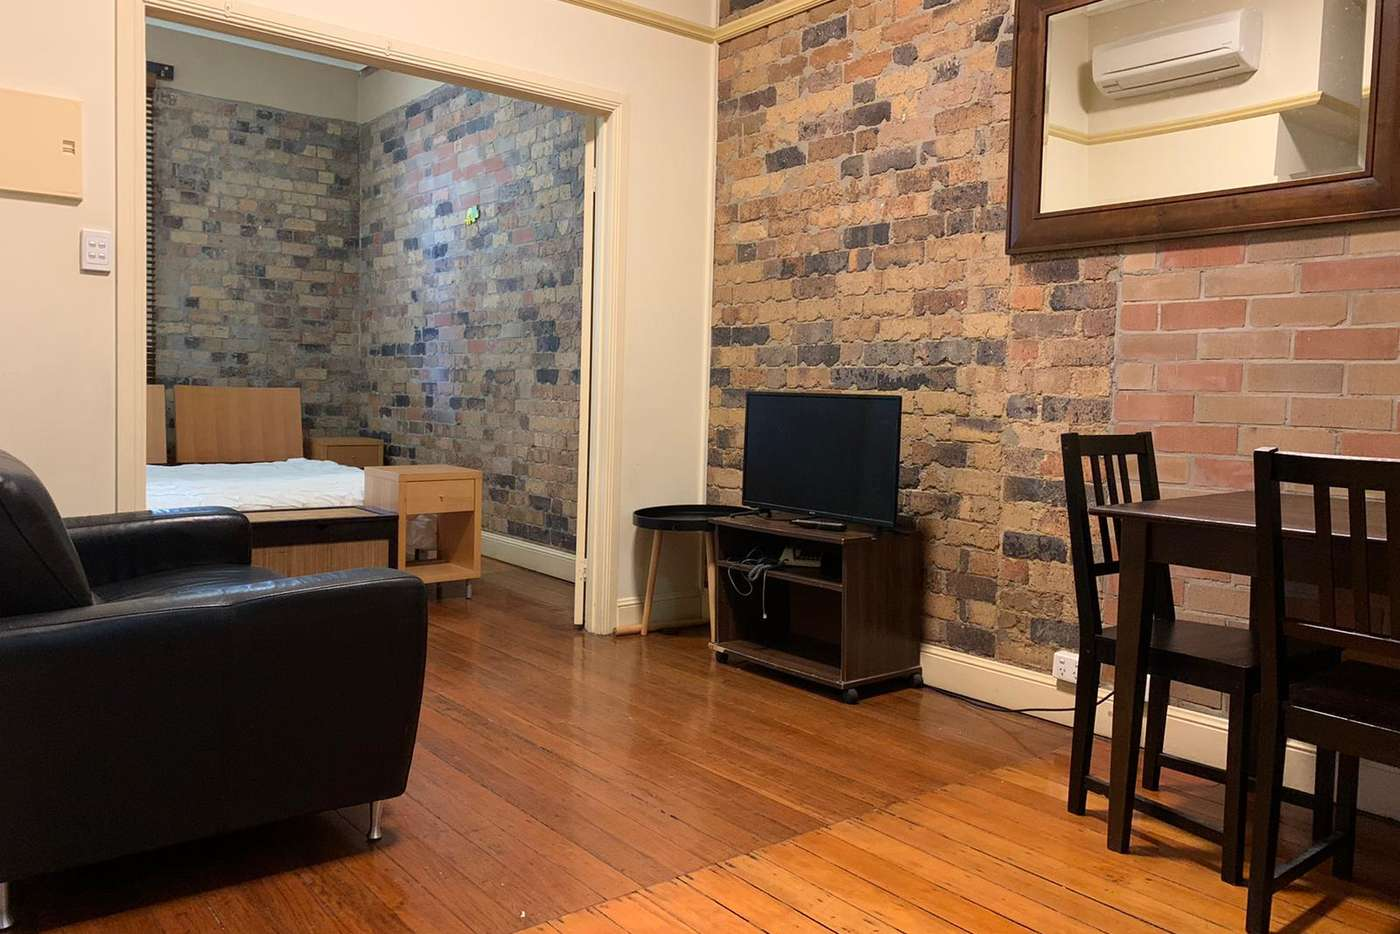 Main view of Homely unit listing, 53 Edward Street, Brisbane QLD 4000